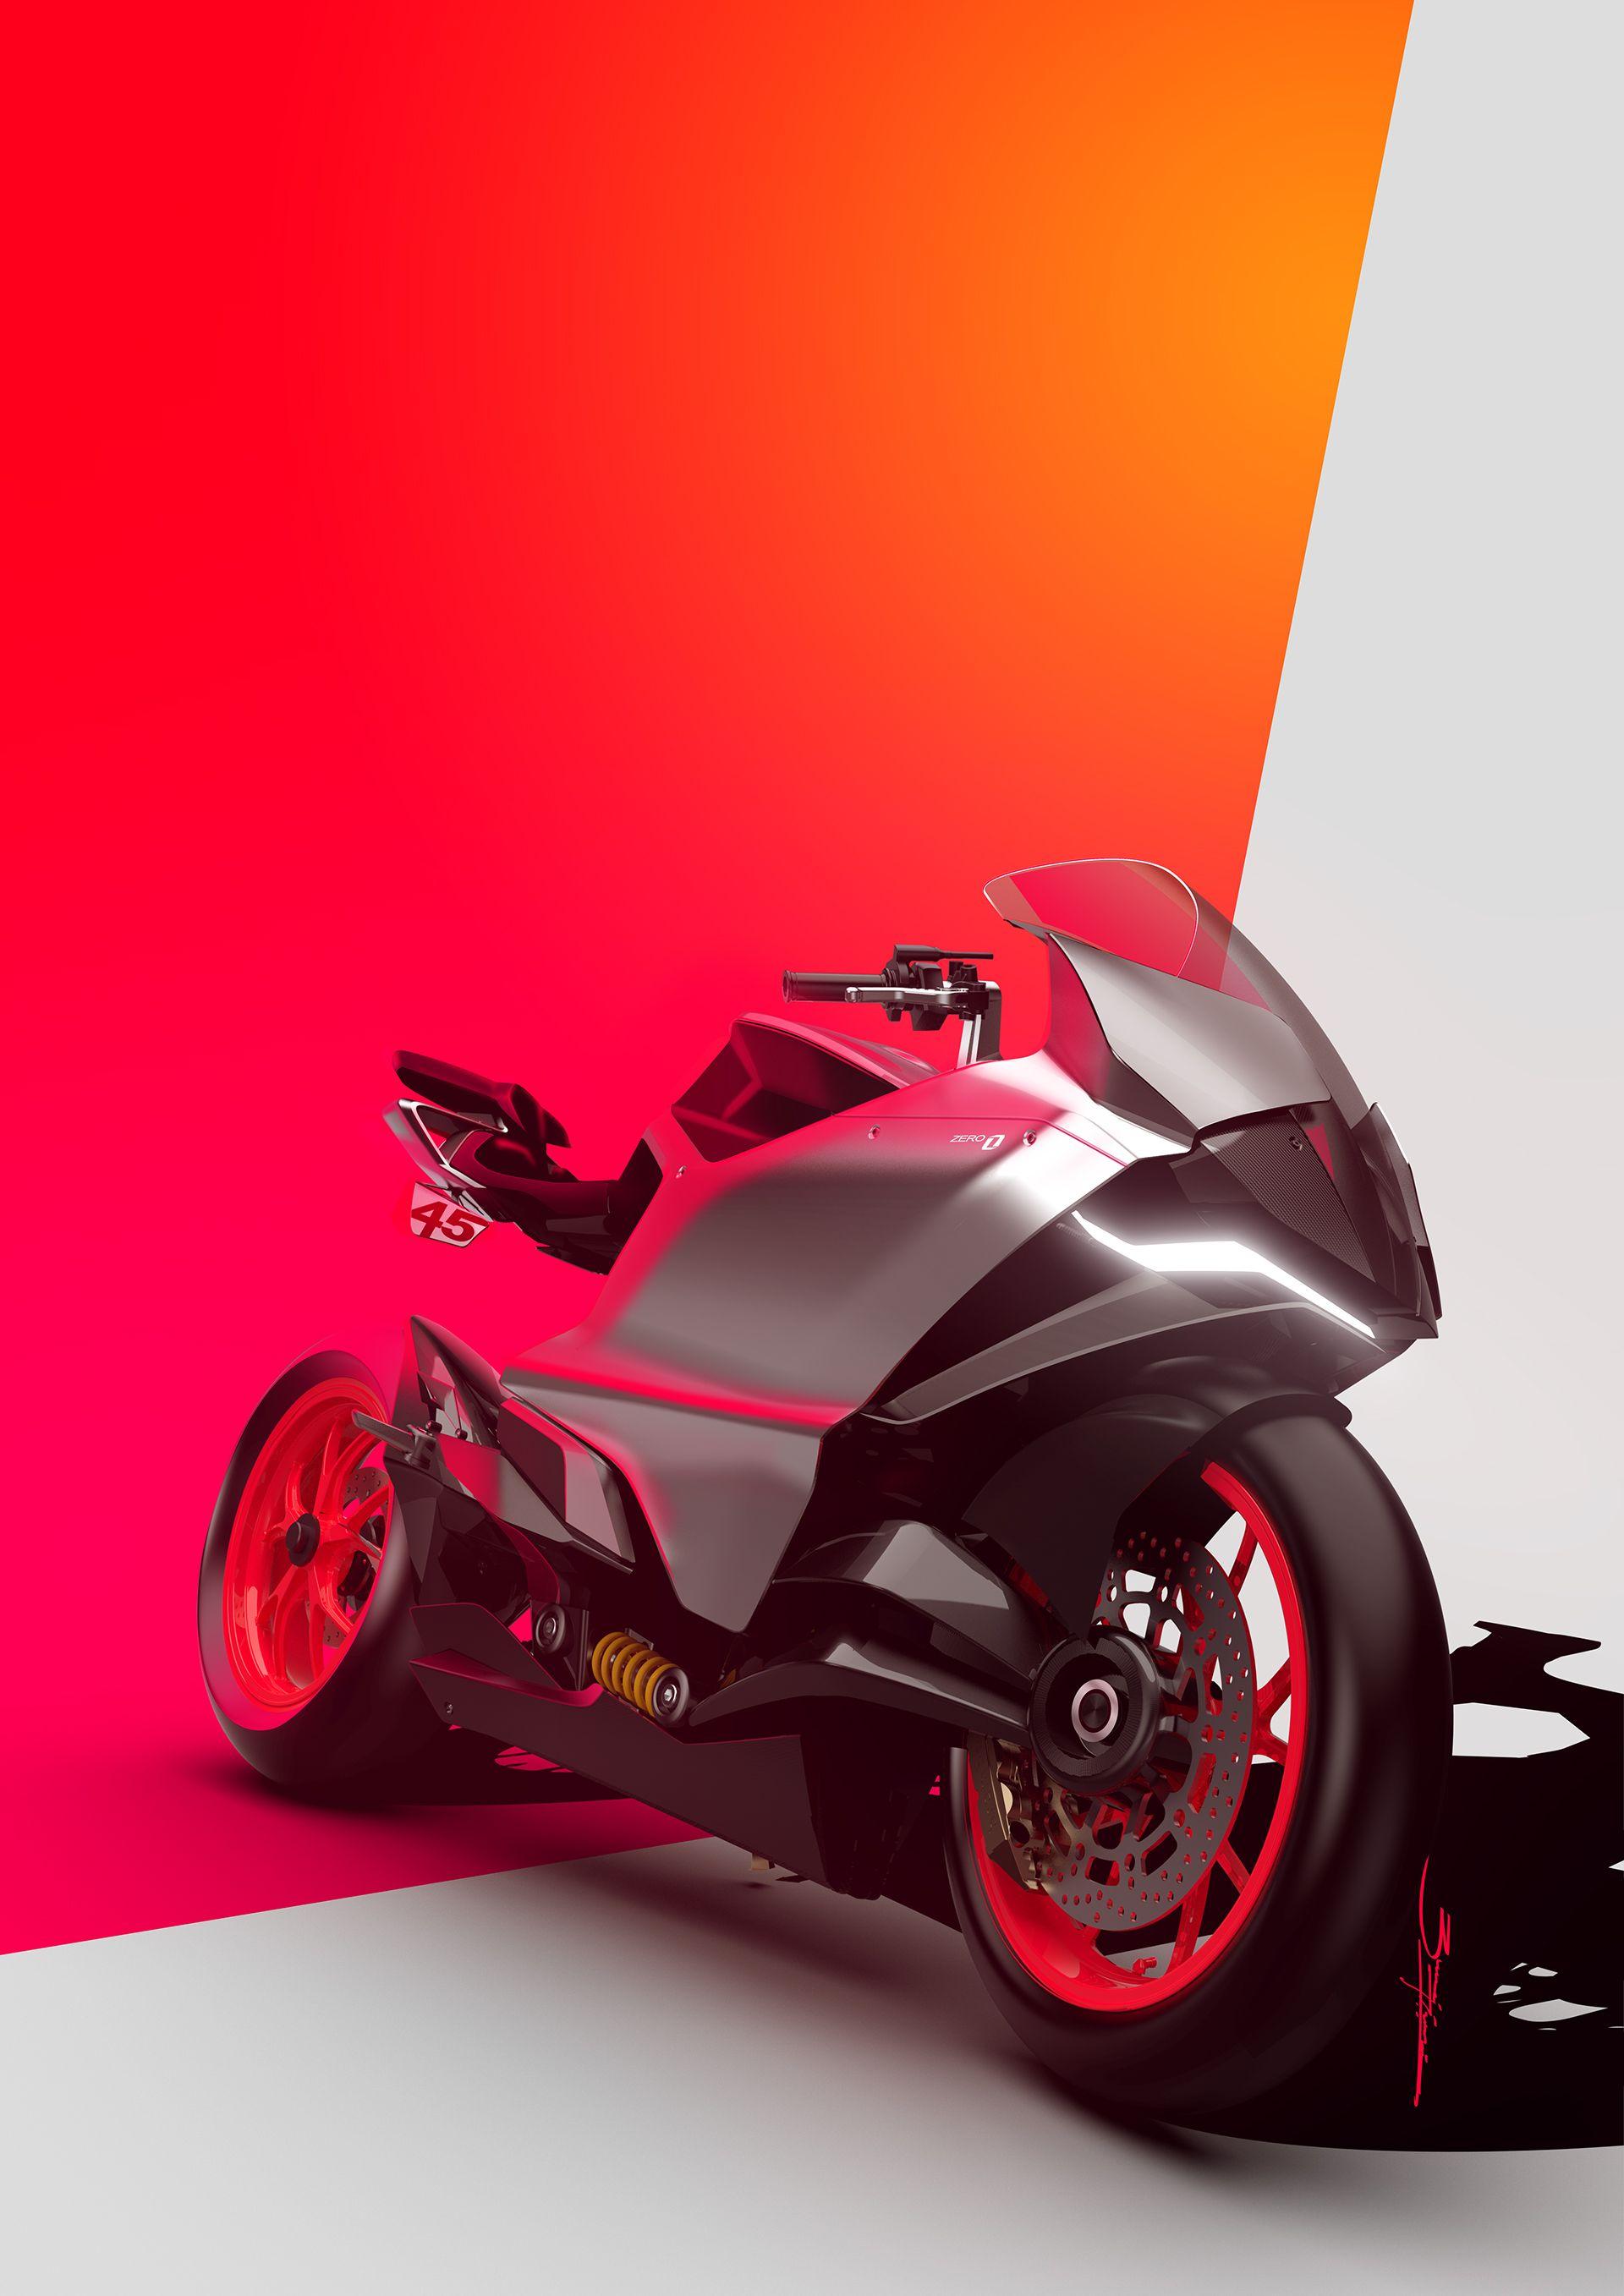 Ducati Zero Electric Superbike Titanium Renders On Behance With